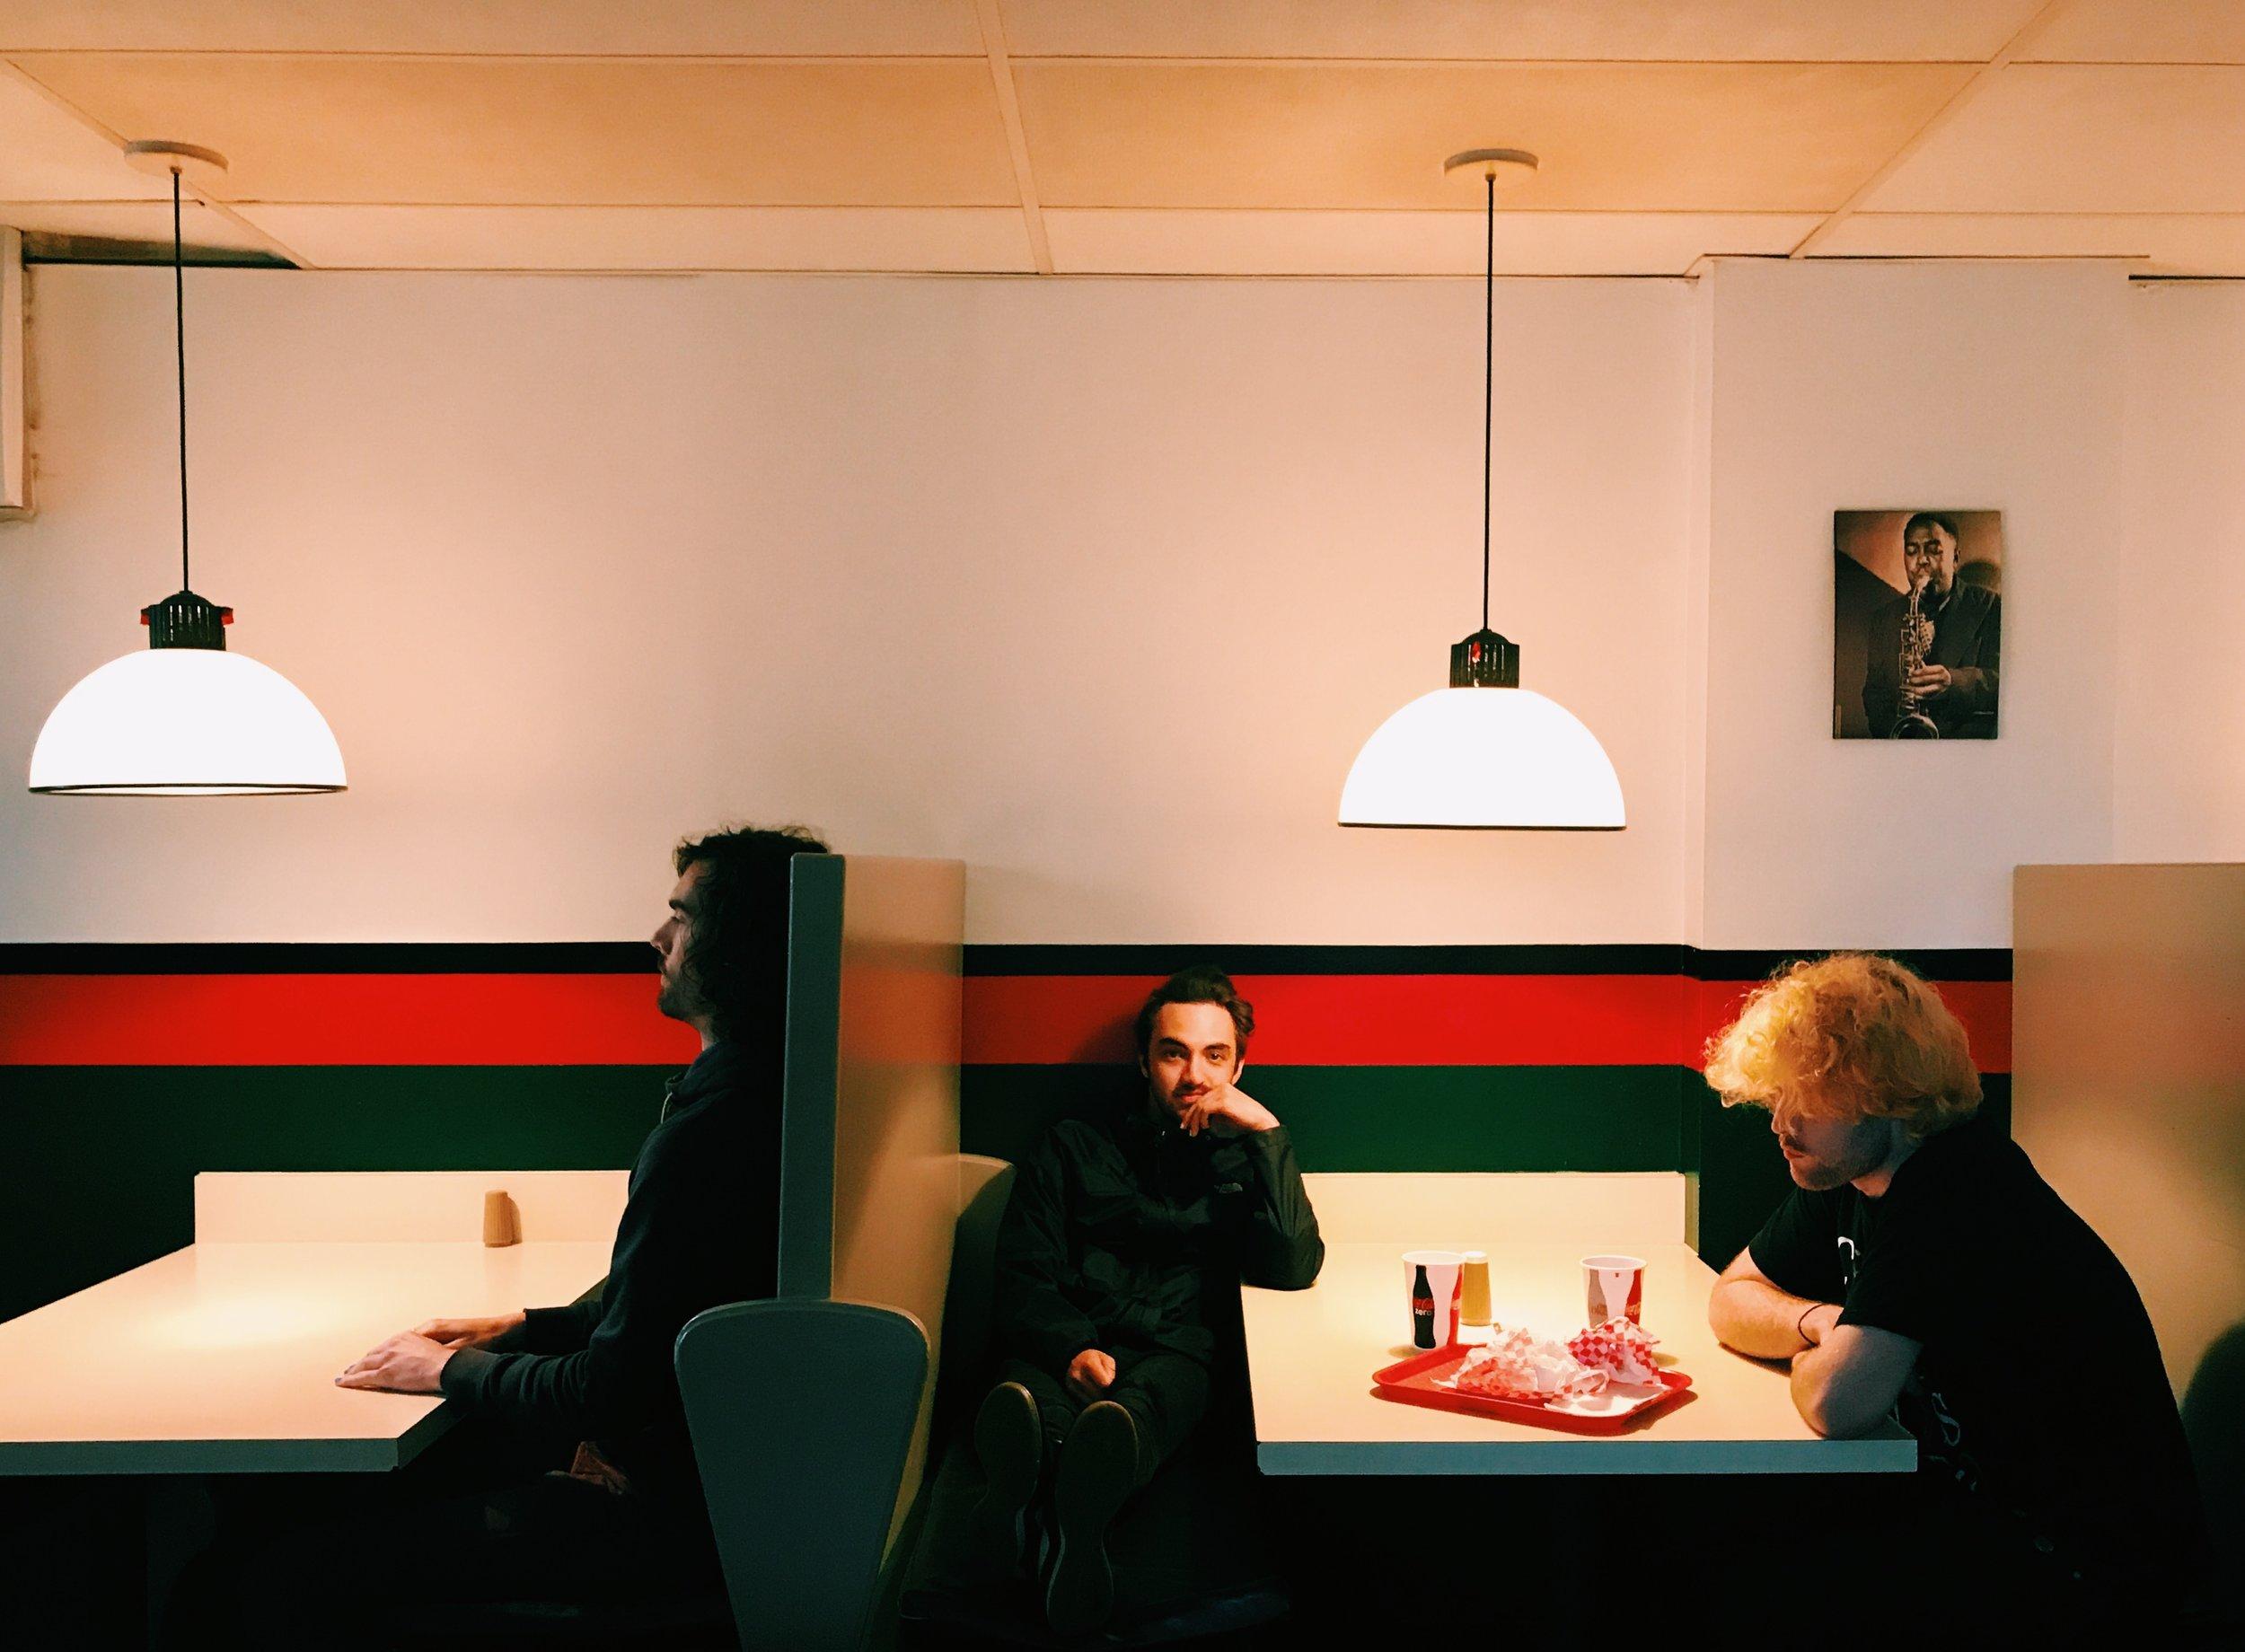 The Co Founder (Press Photo) - Pic by Nikko Van Wyck.jpg